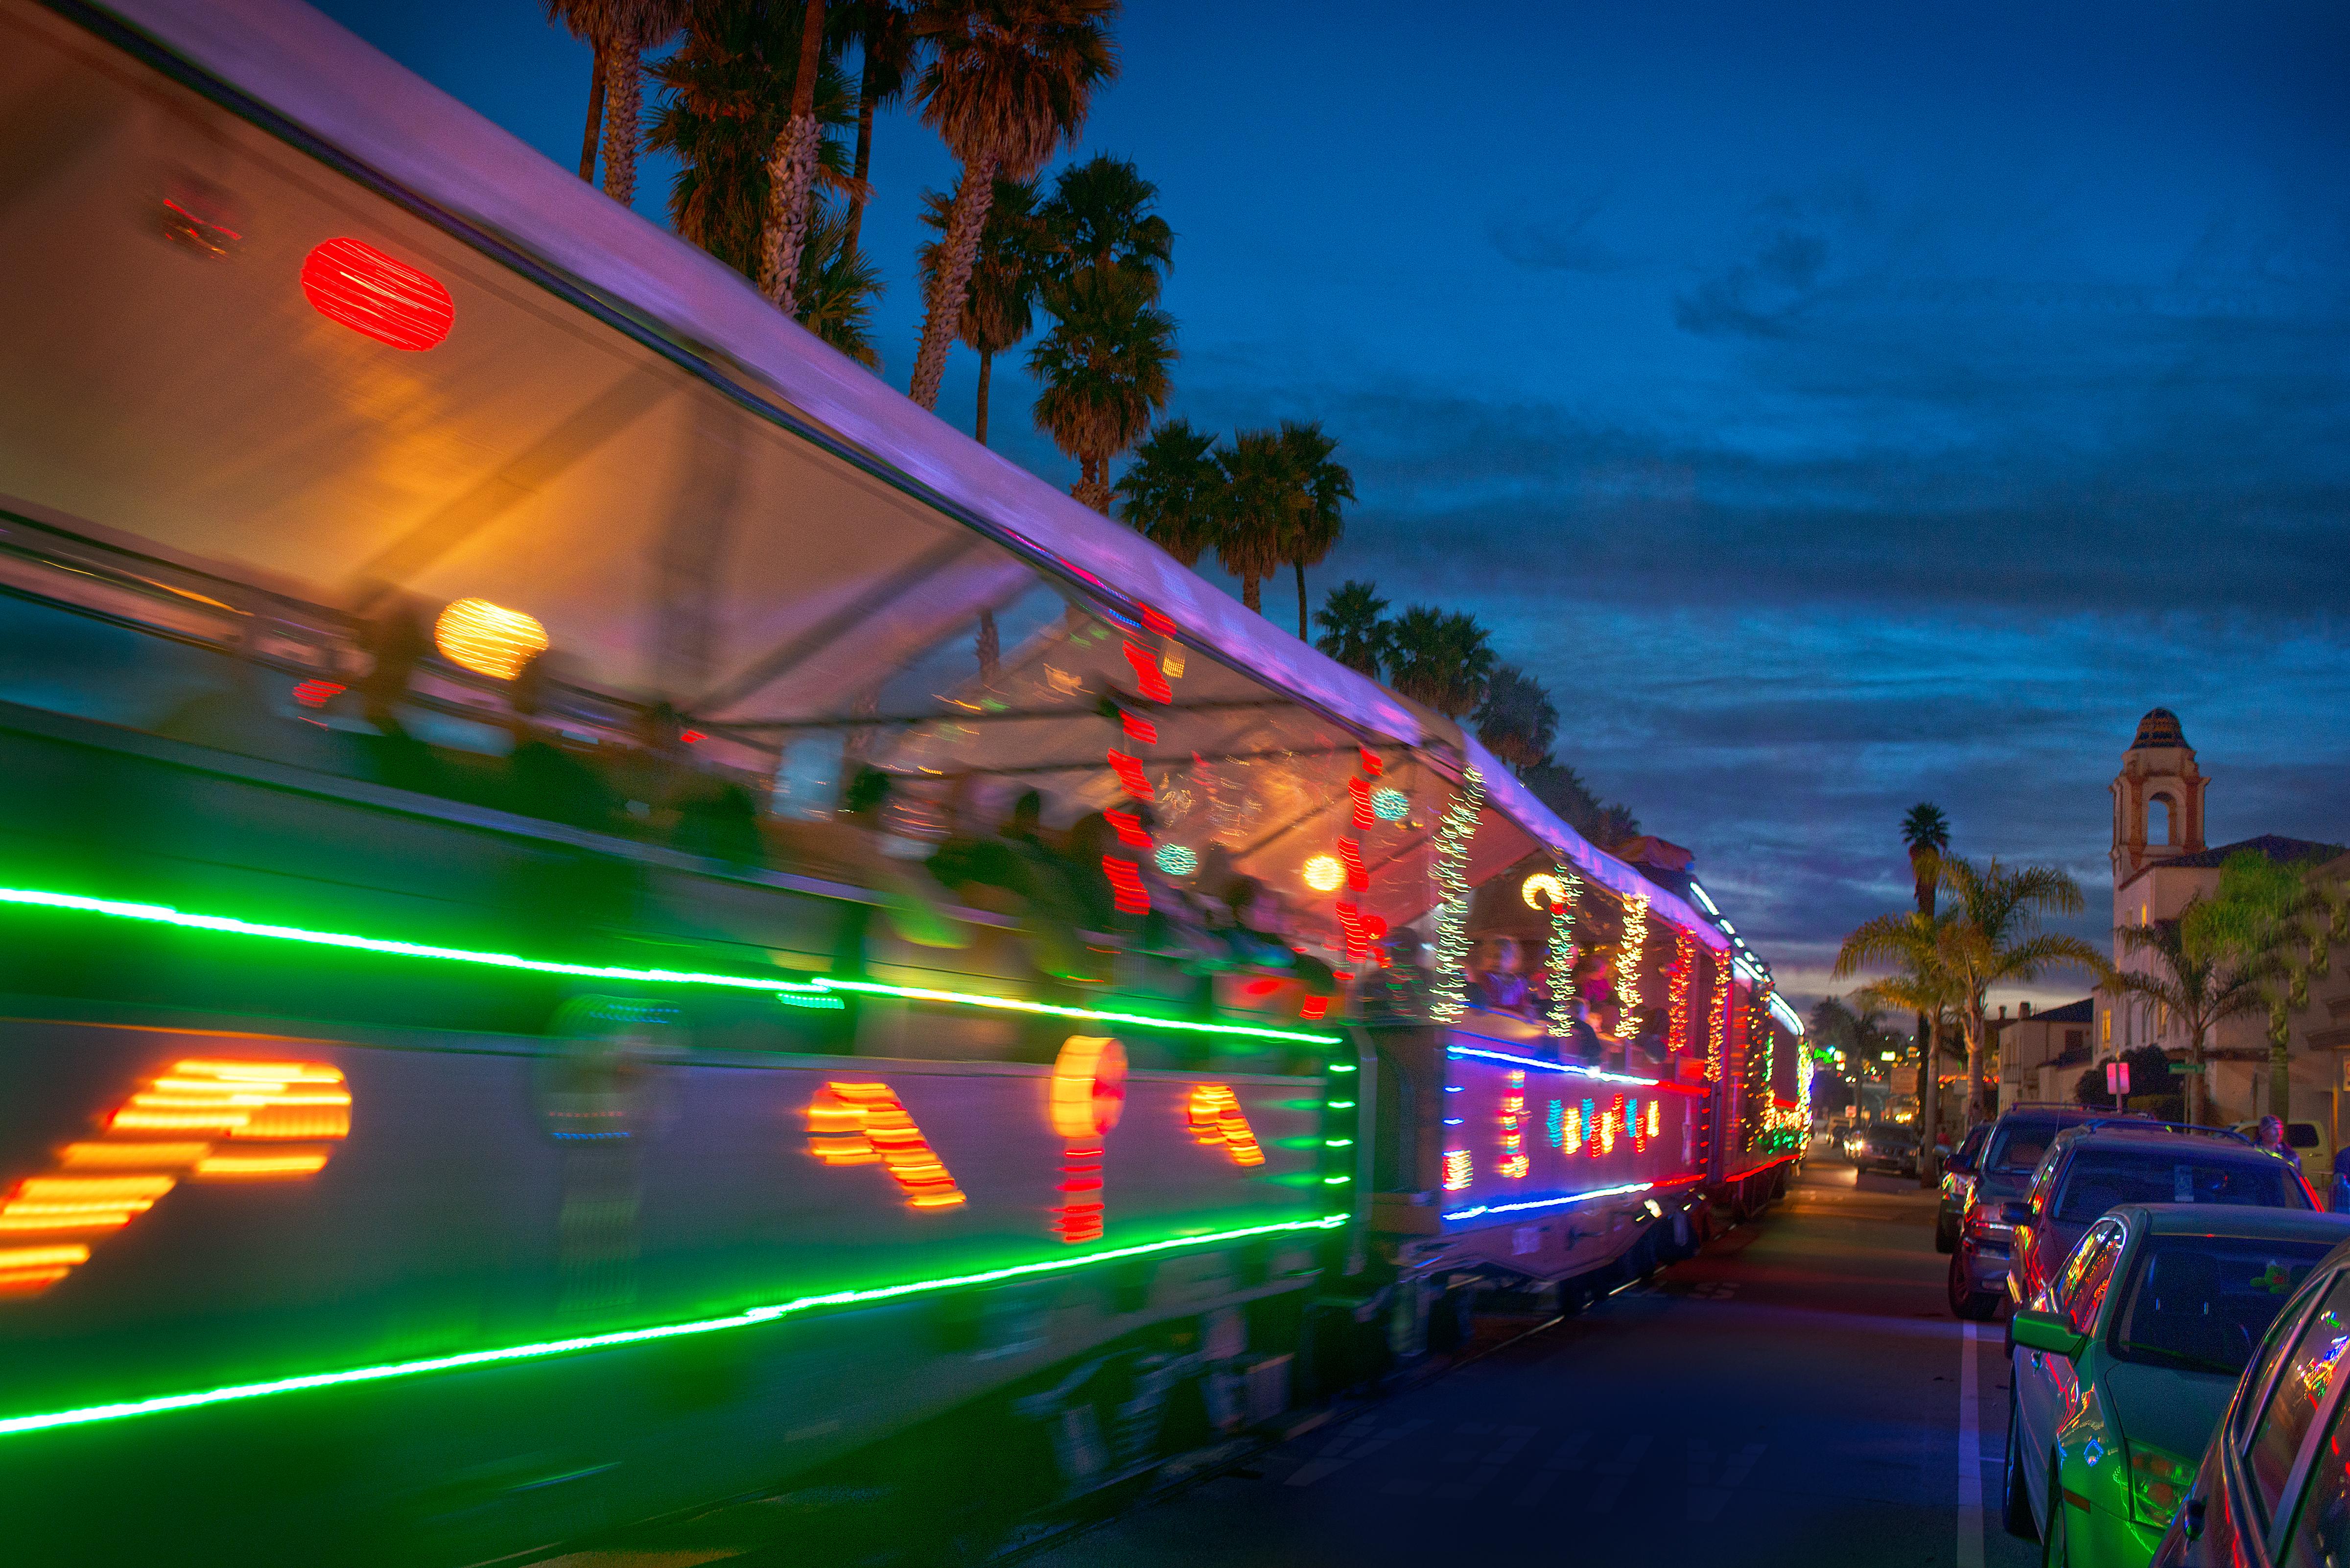 holiday lights train photo credit paul schraub santa cruz